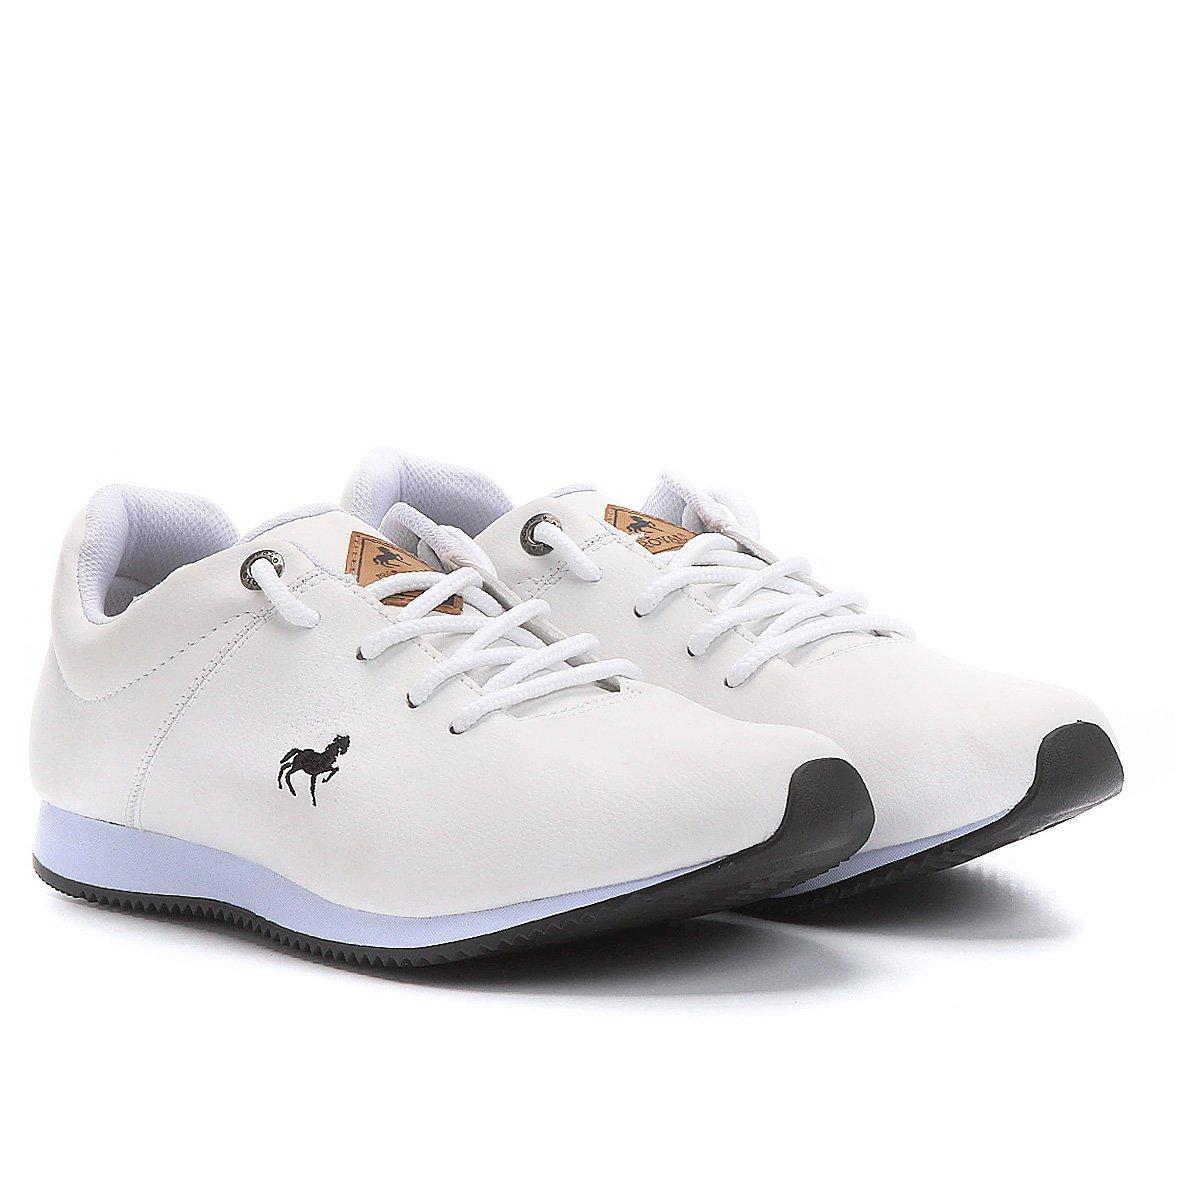 7fa0046374 Tênis Couro Polo Royal Jogging LTH Masculino | Netshoes